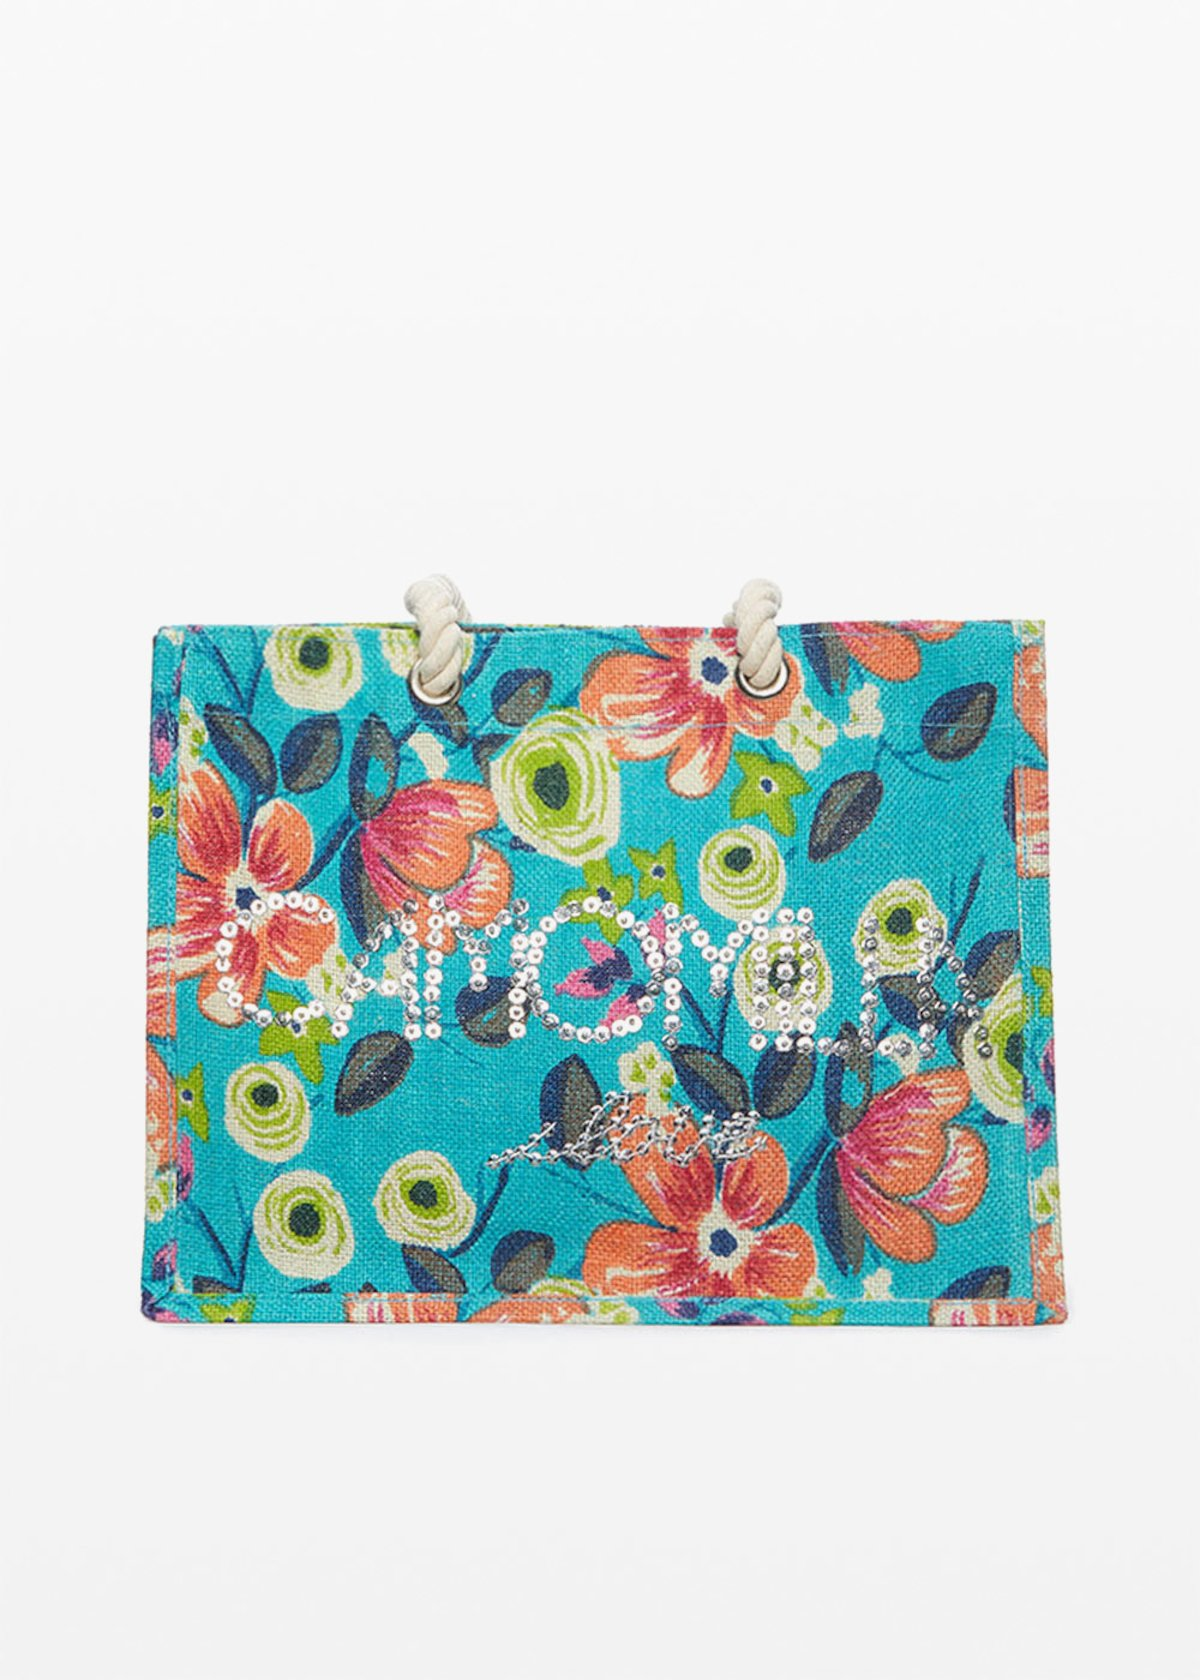 Biky flowers print jute bag with Camomilla ilove logo on the front - Sky / Avocado  Fantasia - Woman